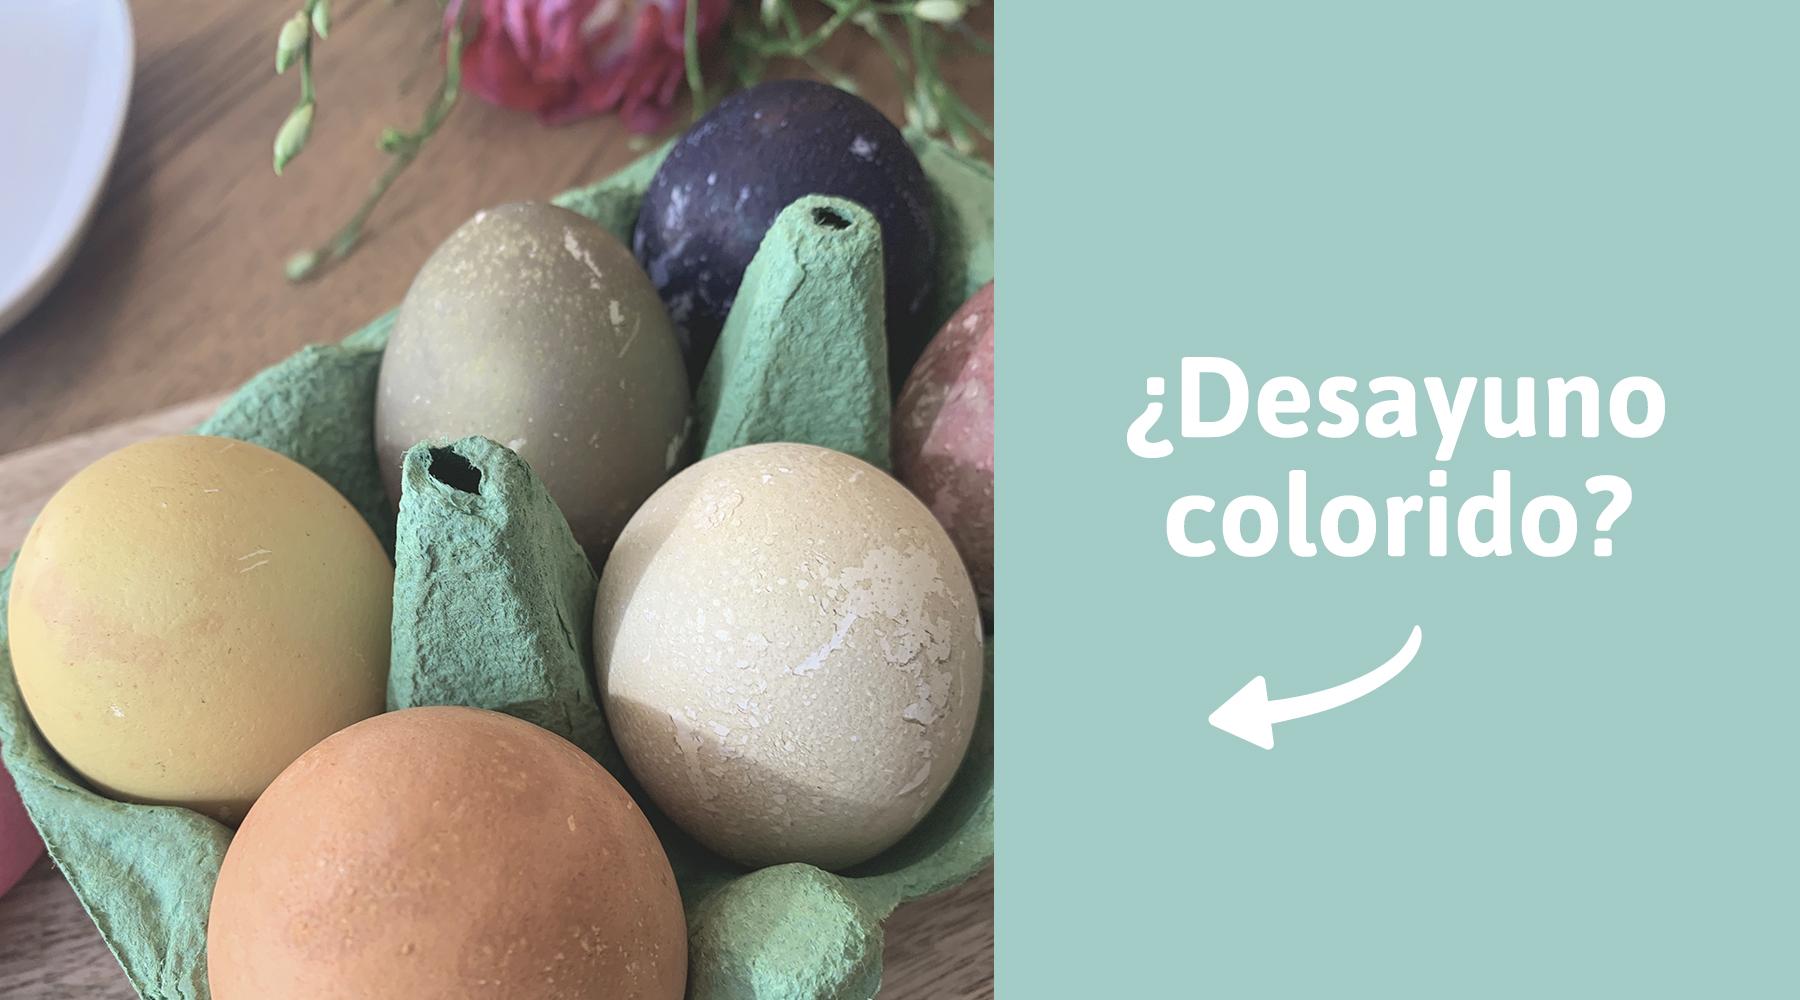 Para colorear huevos de forma natural: